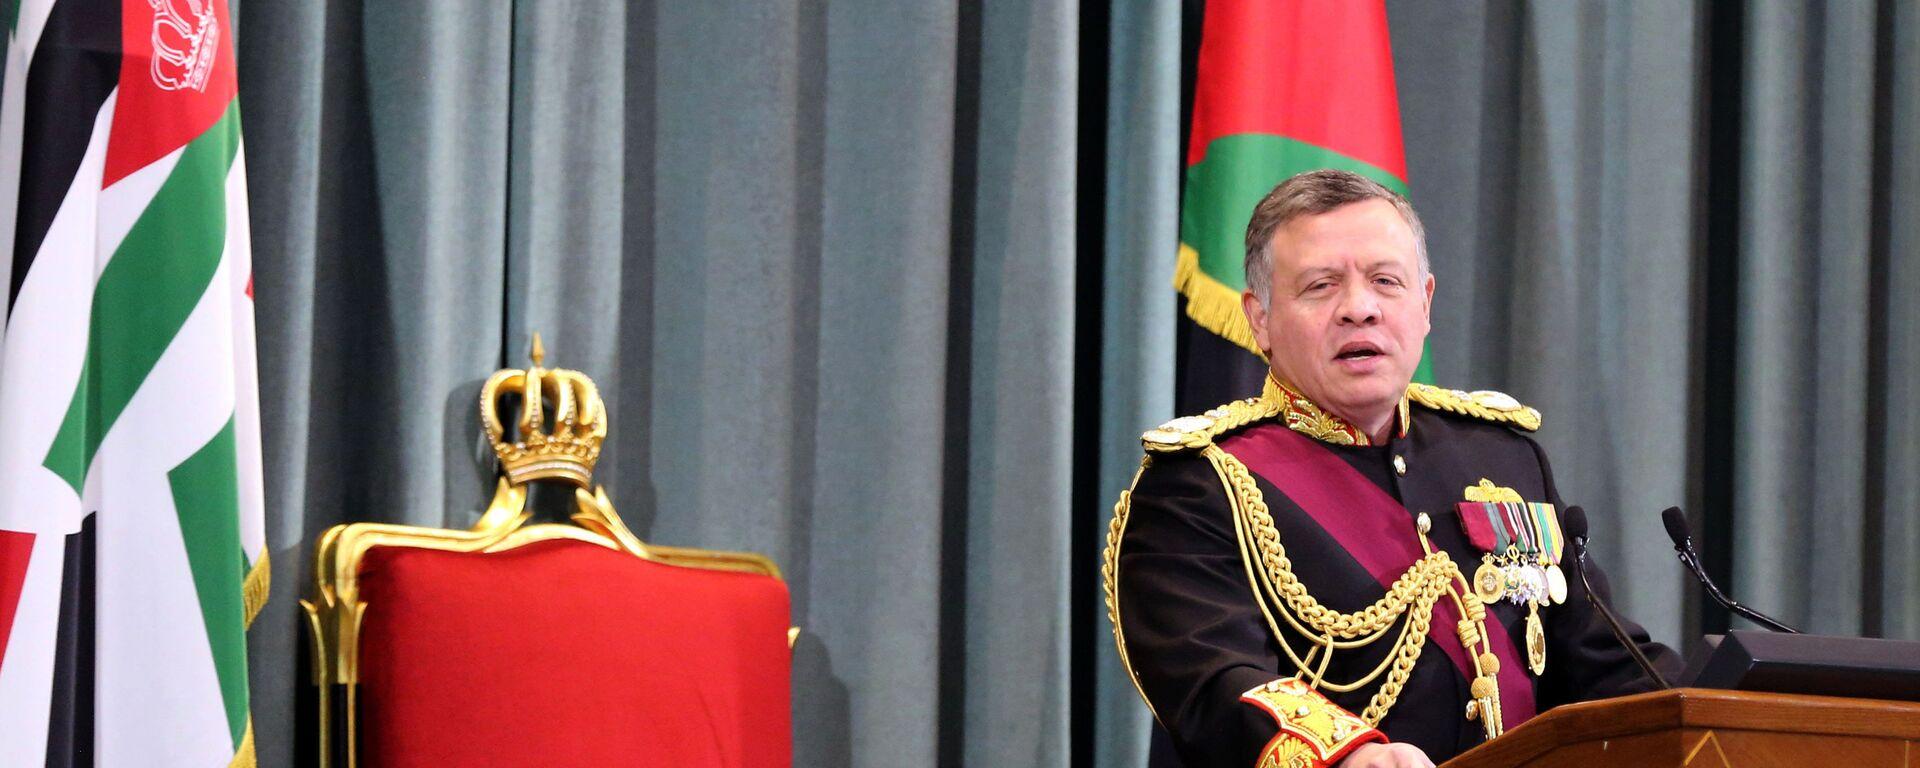 Jordanian King Abdullah II delivers a speech at the parliament (file) - Sputnik International, 1920, 04.10.2021